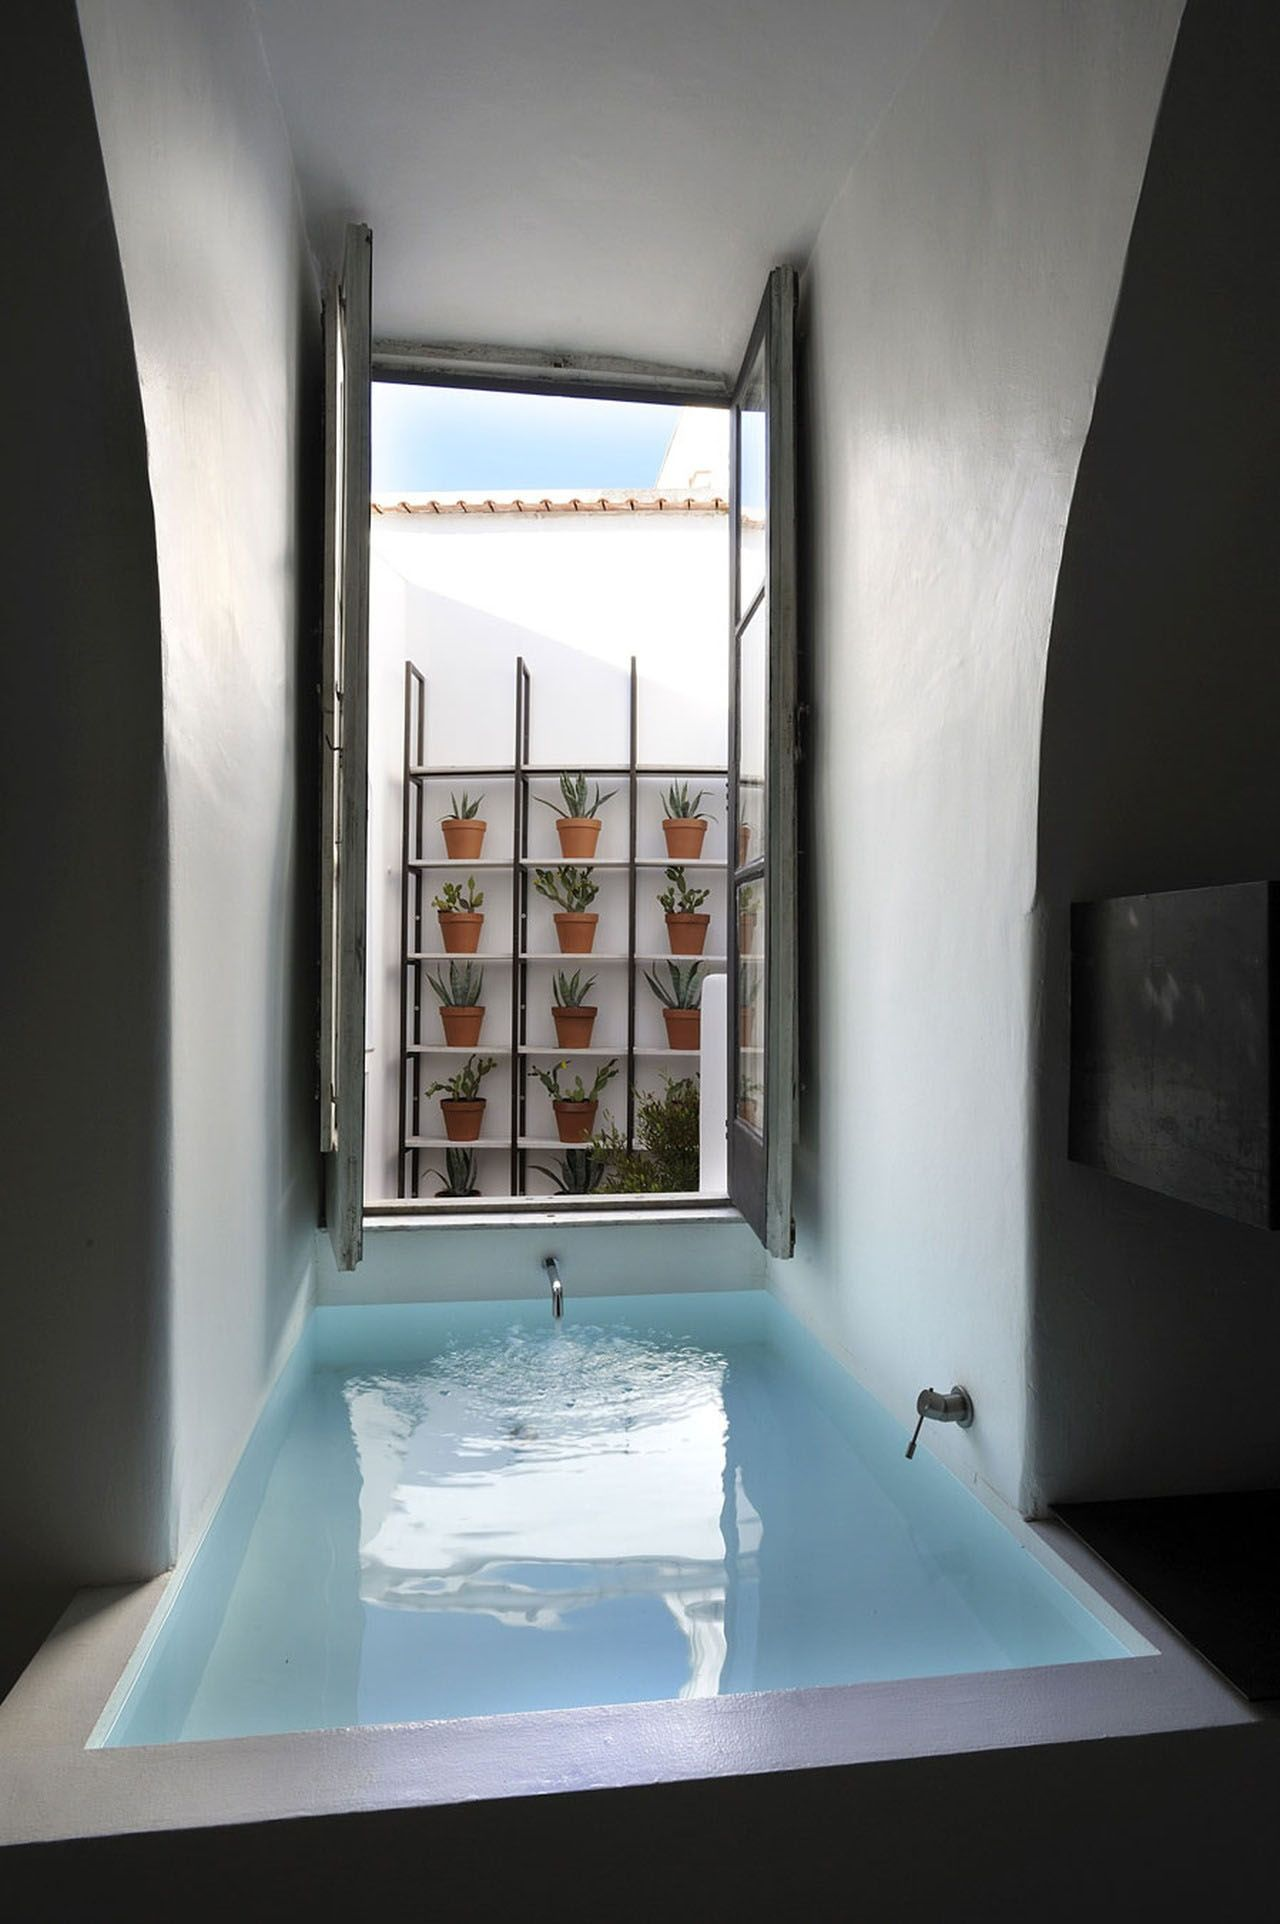 Minimalist Capri Suite Resort Hotel In Anacapri, ITALY | S P A C E S ...